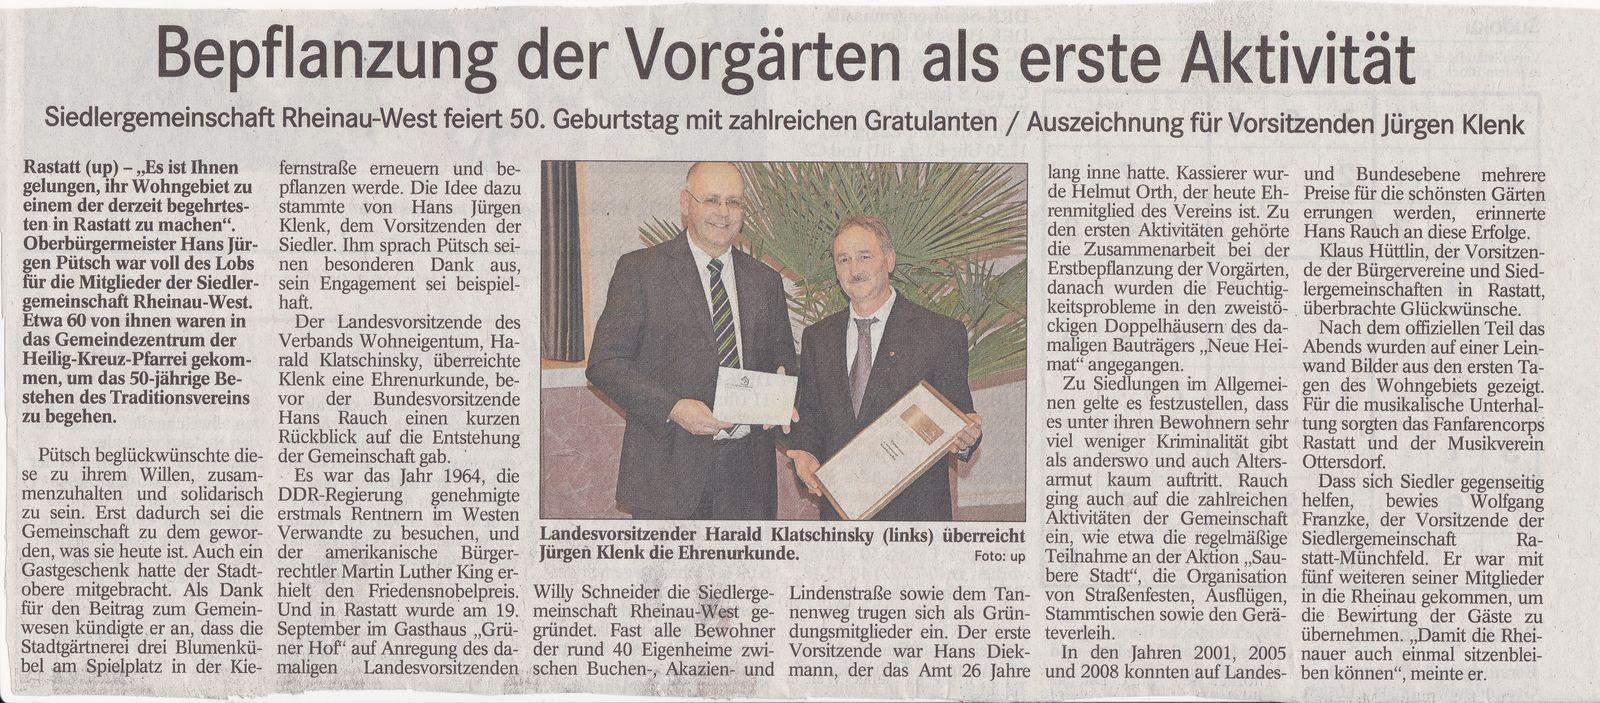 Jubiläumfeier SG Rastatt-Rheinau-West